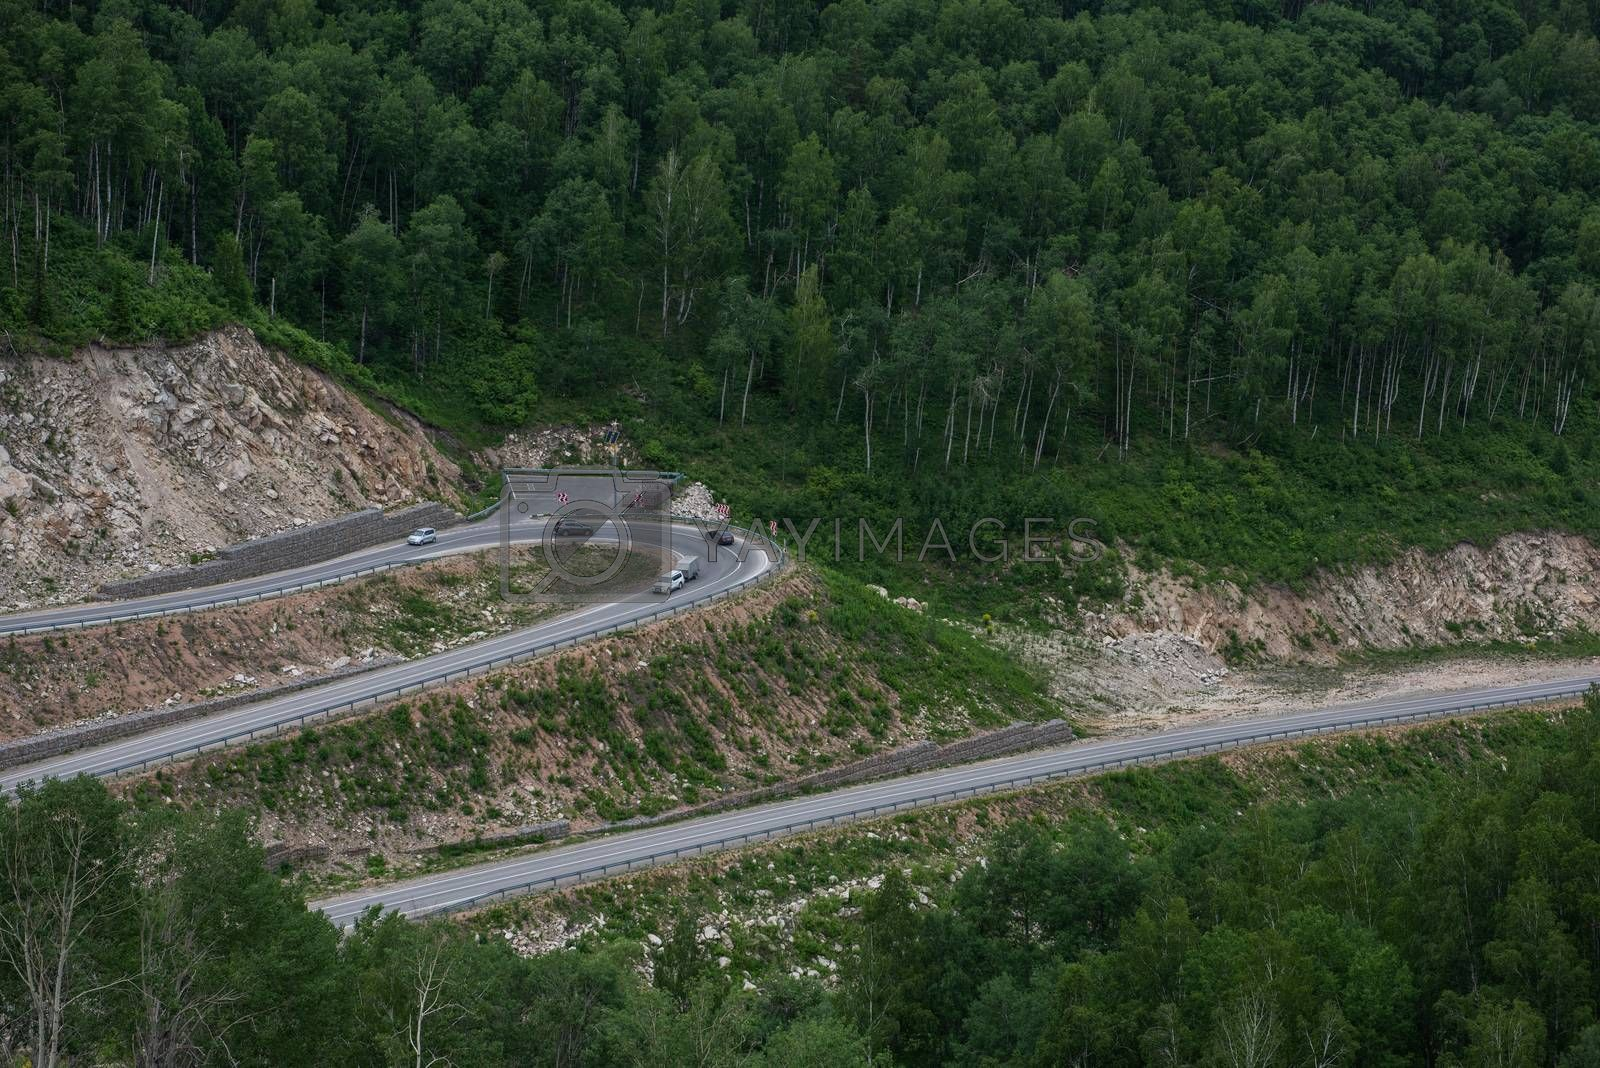 Winding road in the mountains, drone shot. Altai Krai, Western Siberia, Russia. Road to Resort town Belokurikha 2